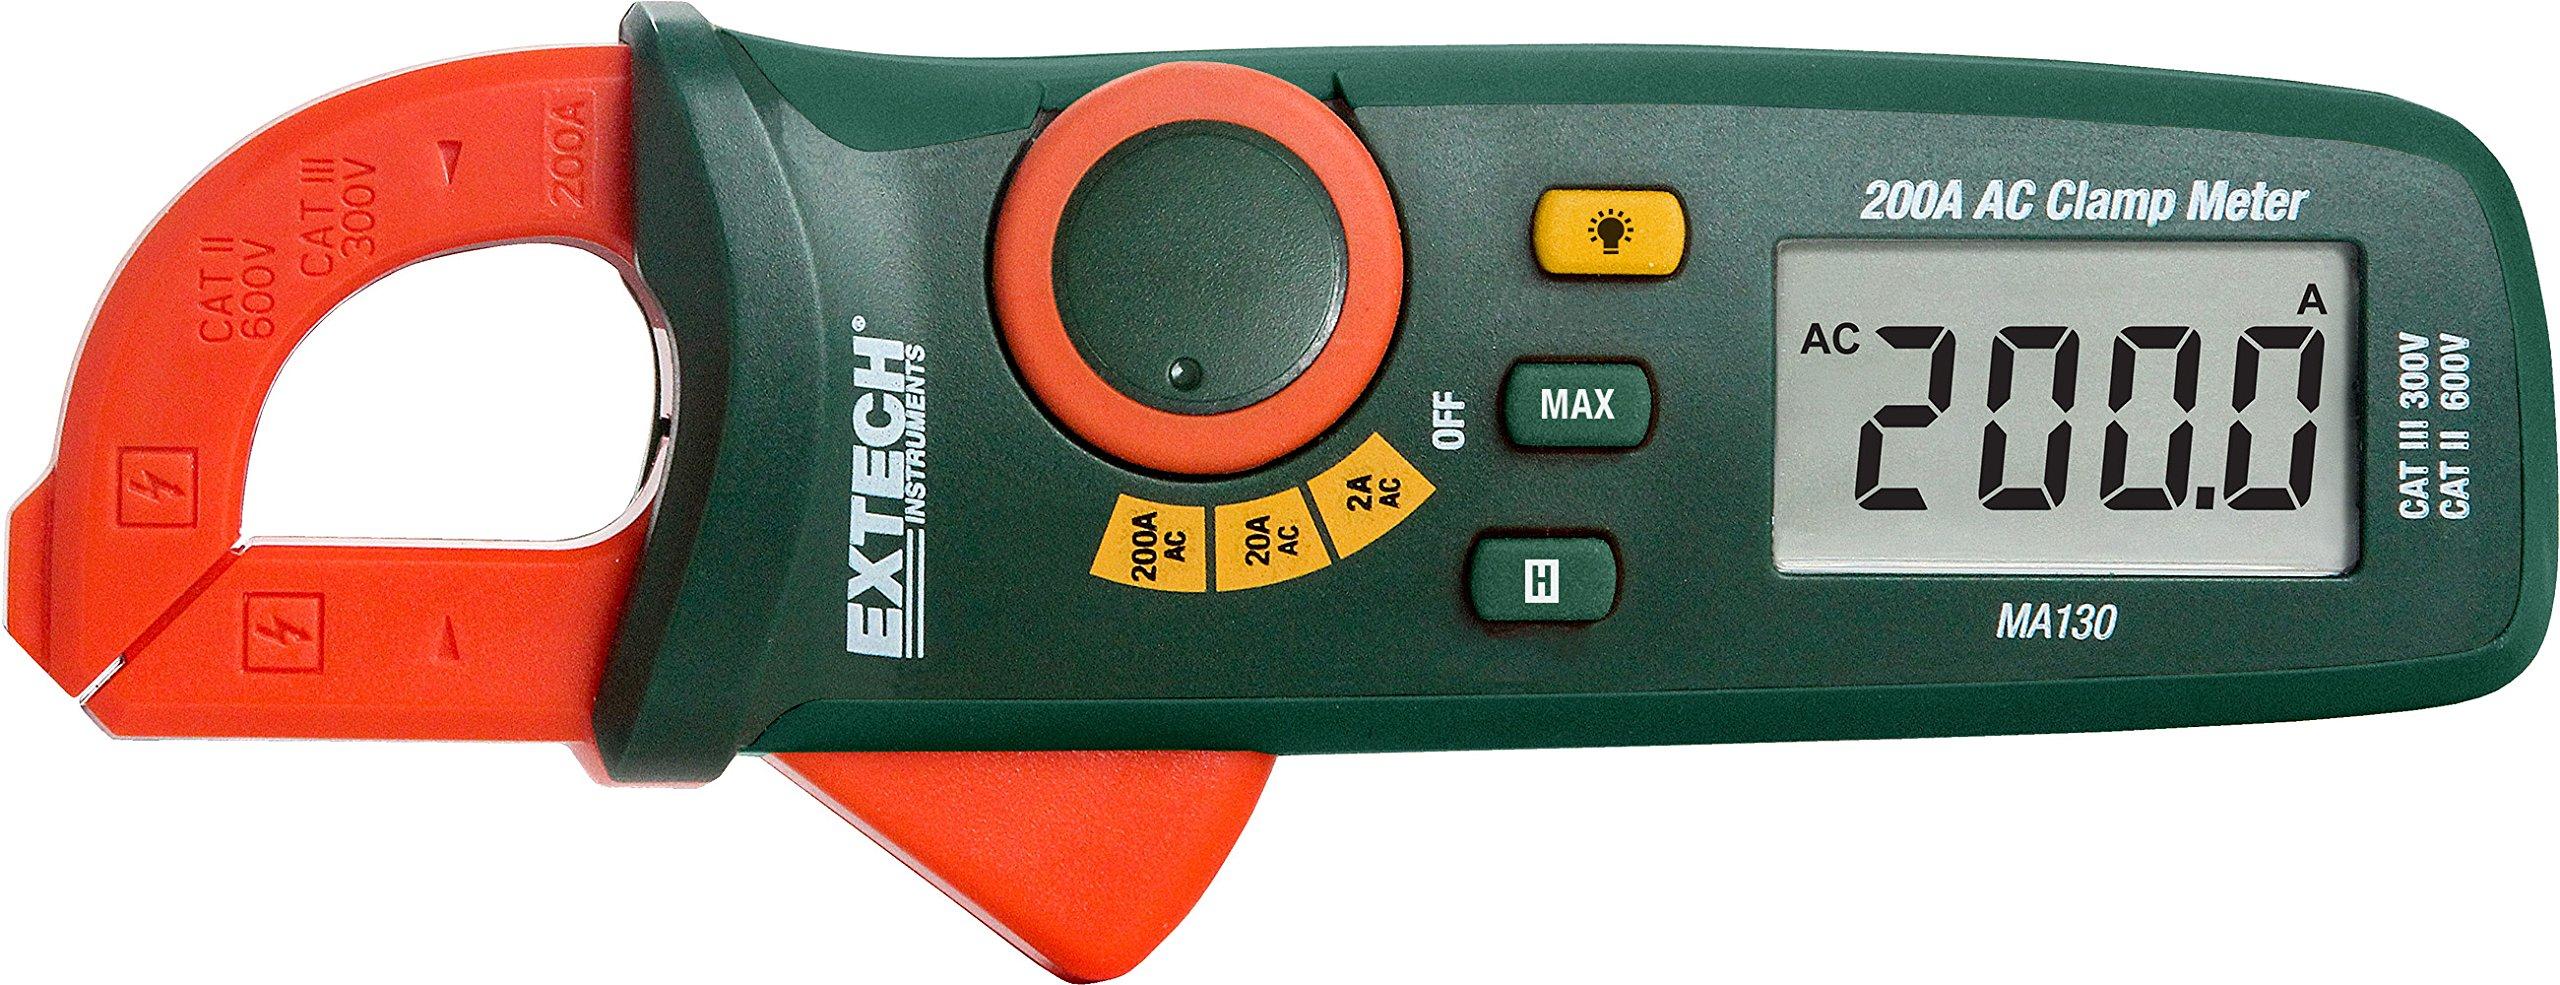 Extech MA130 Mini 200A AC Clamp Meter